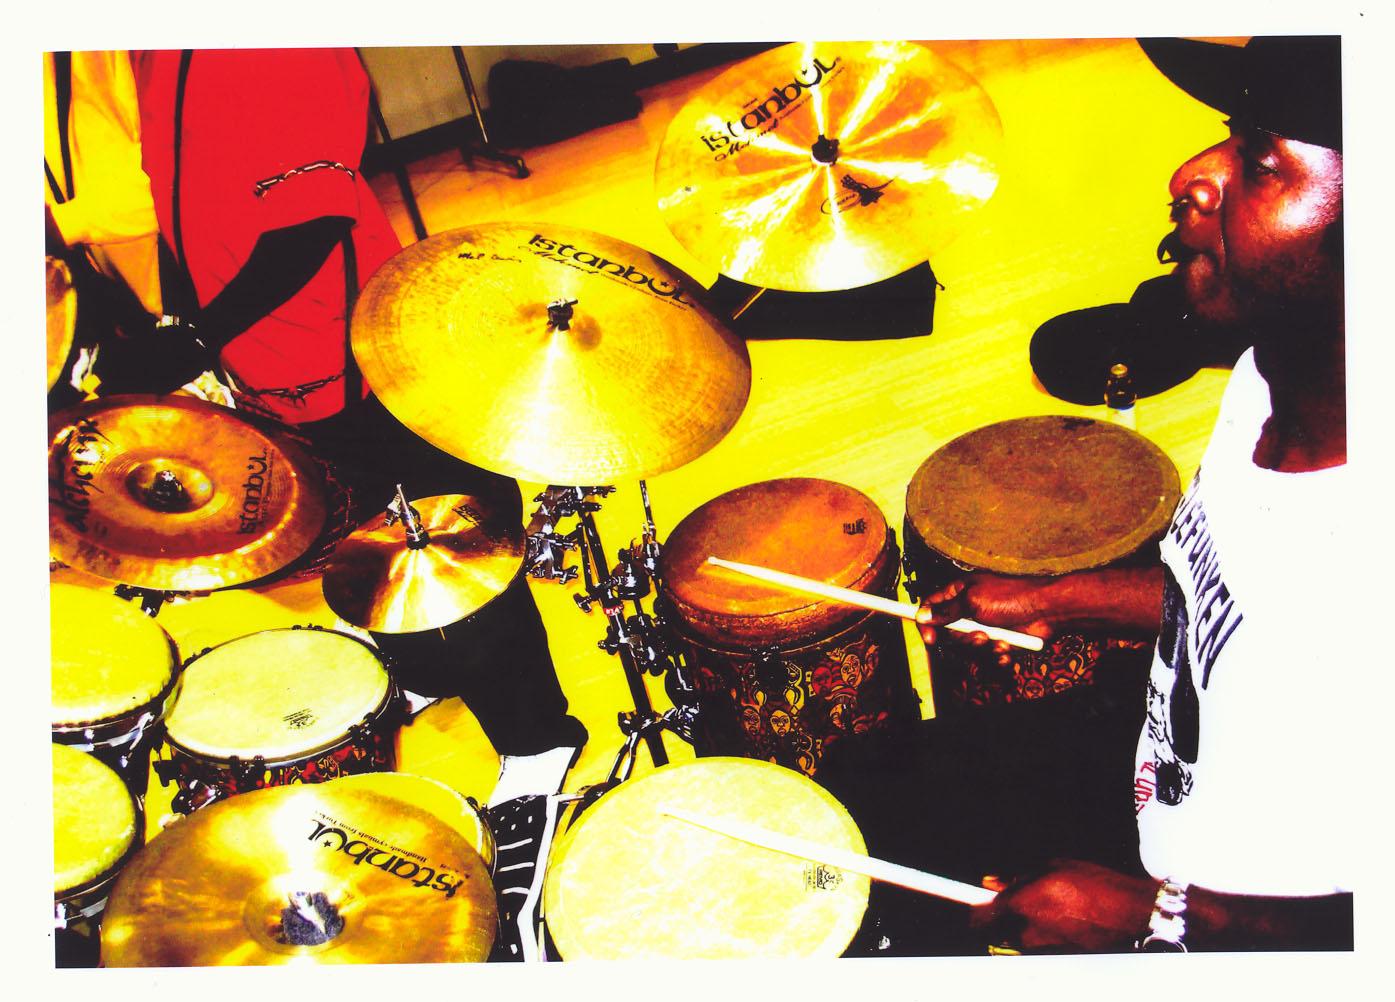 Marcus endorses Istanbul Mehmet cymbals.